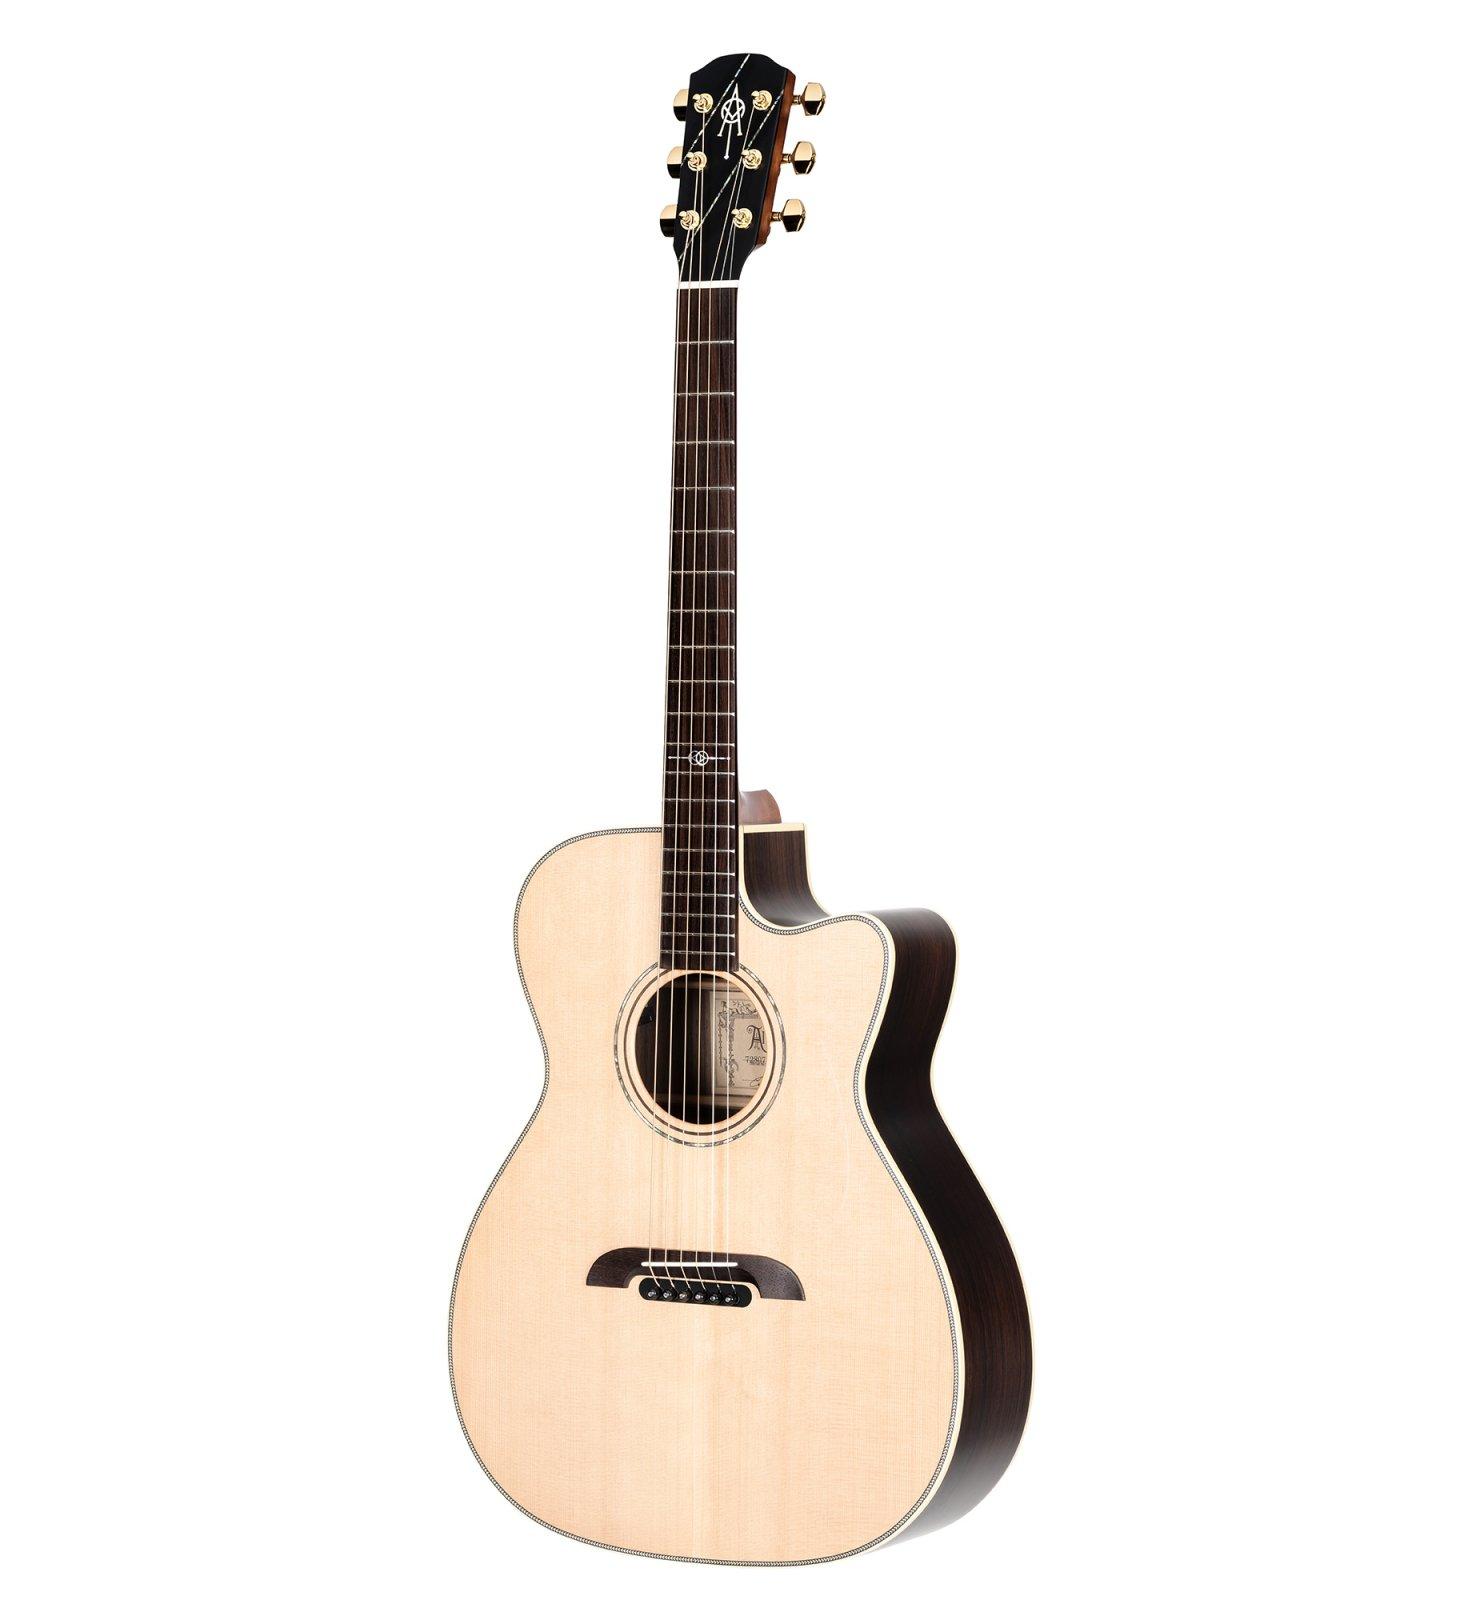 Alvarez Yairi WY1 Acoustic Electric Guitar Bob Weir Model